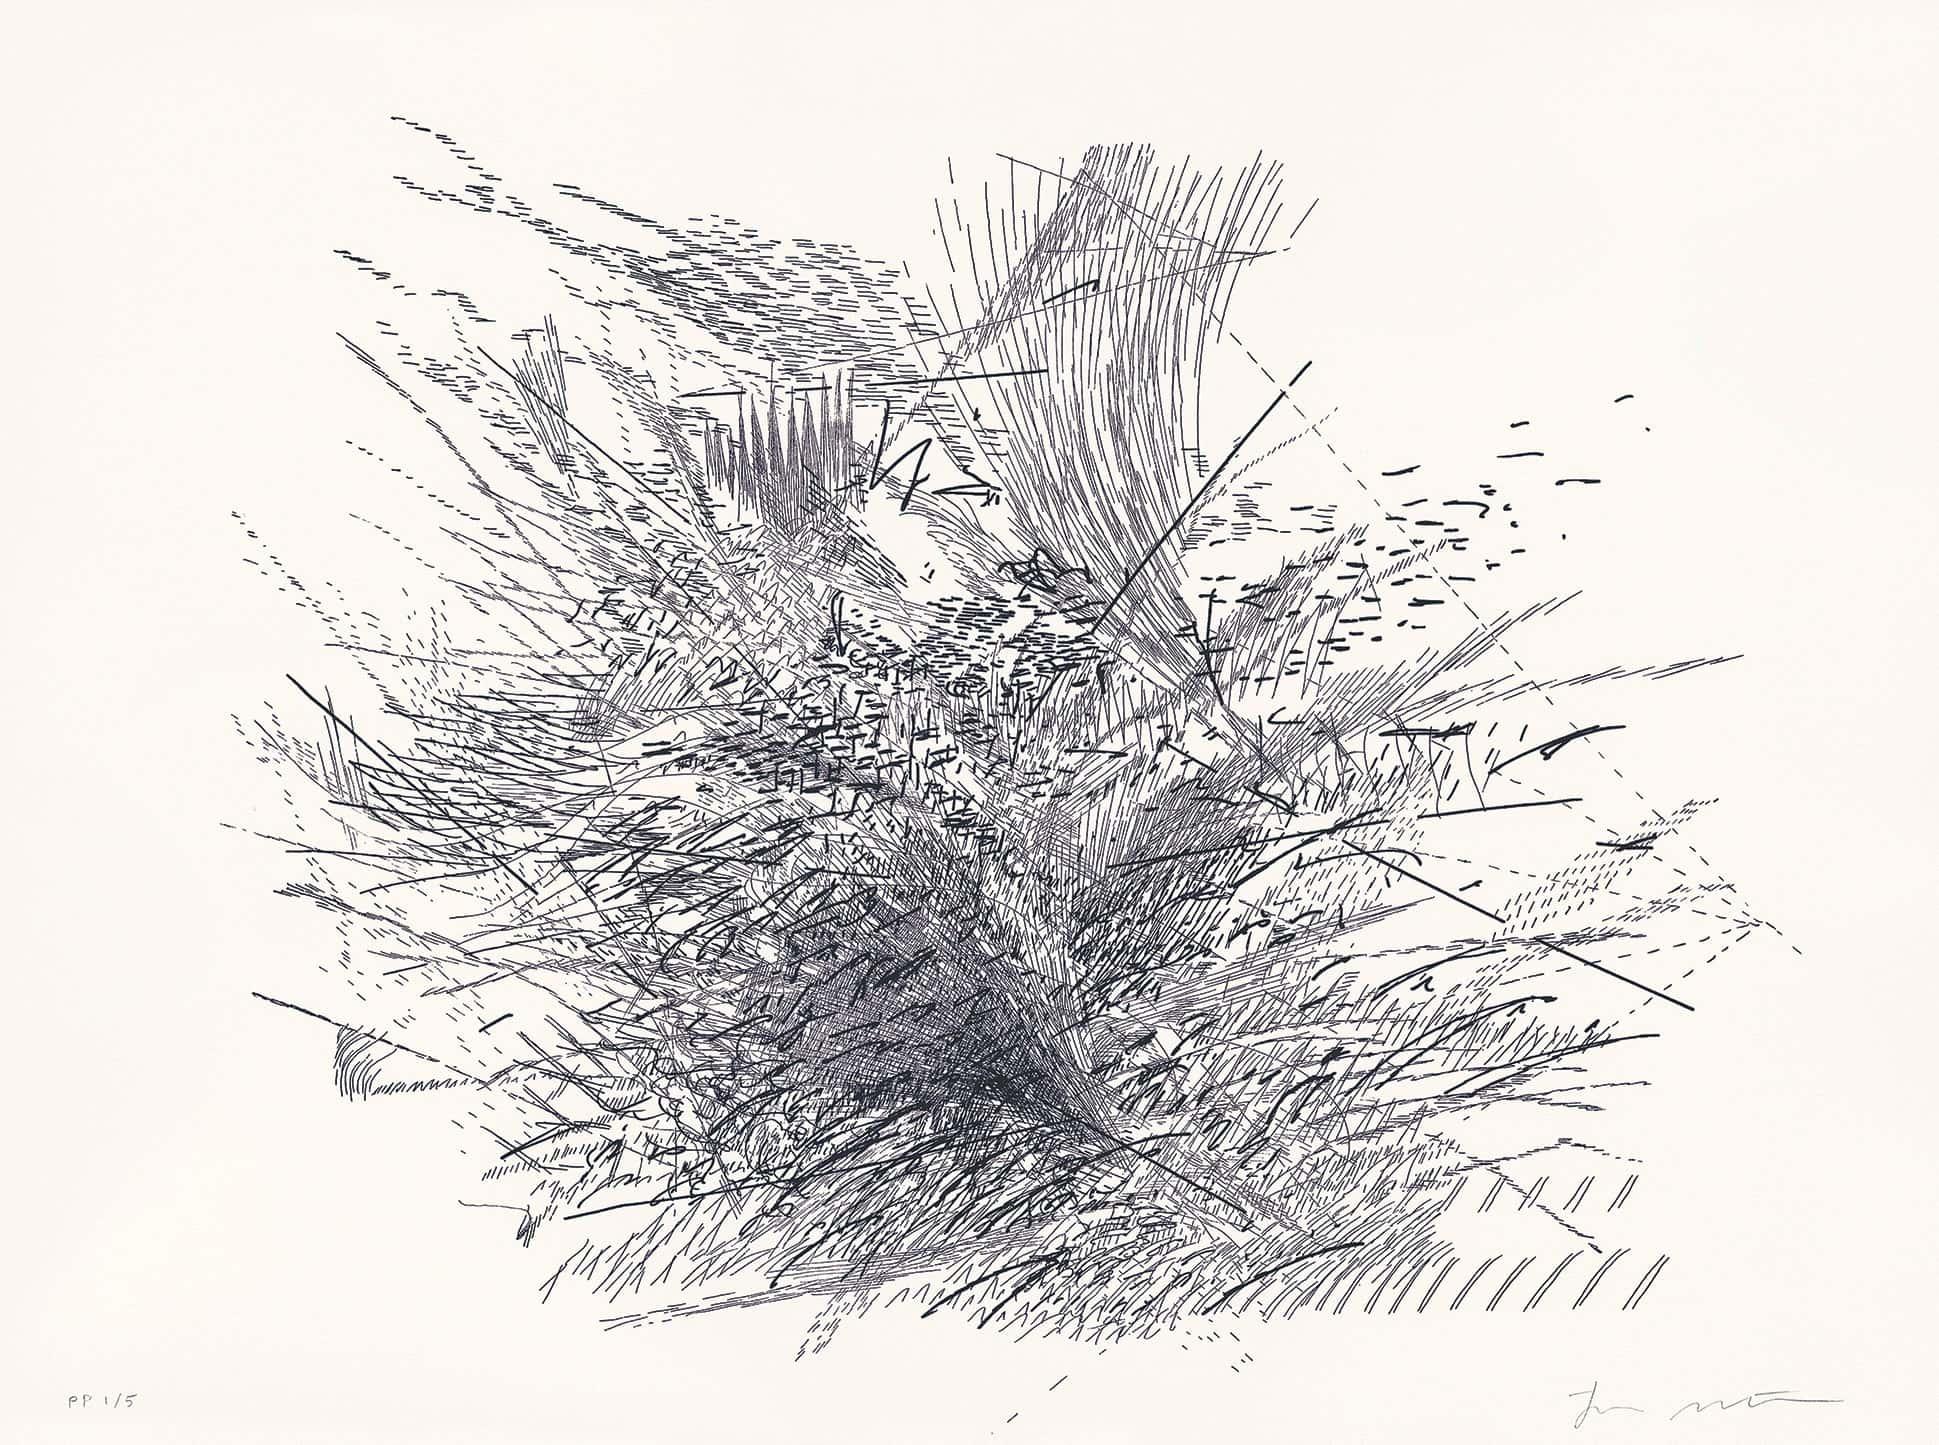 Sappho-Strophe-3.color.jpg